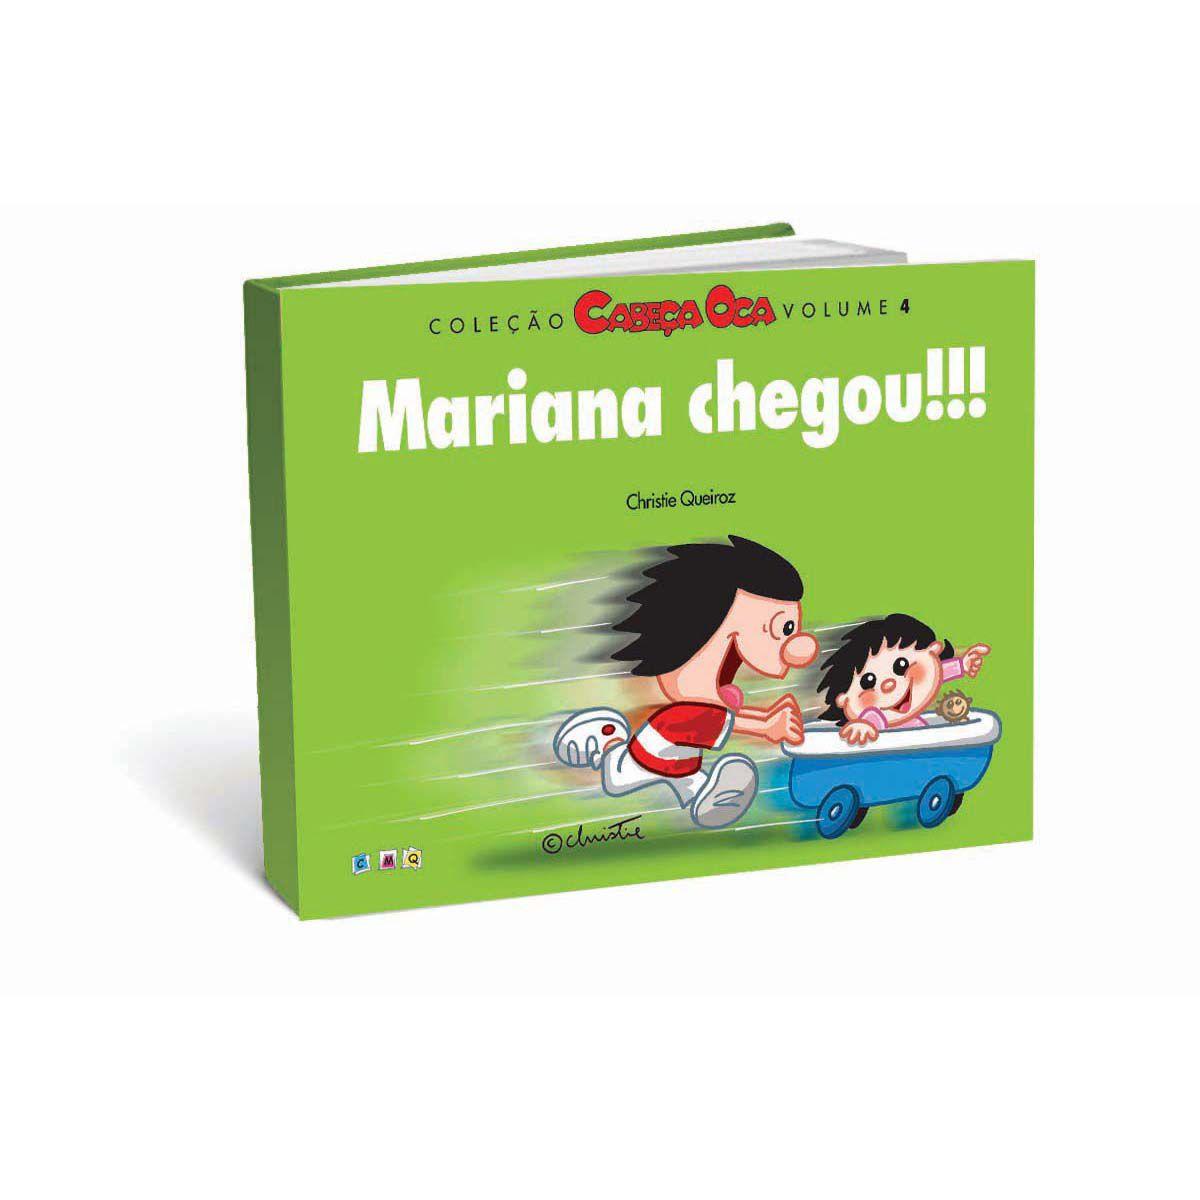 CABEÇA OCA VOLUME 4